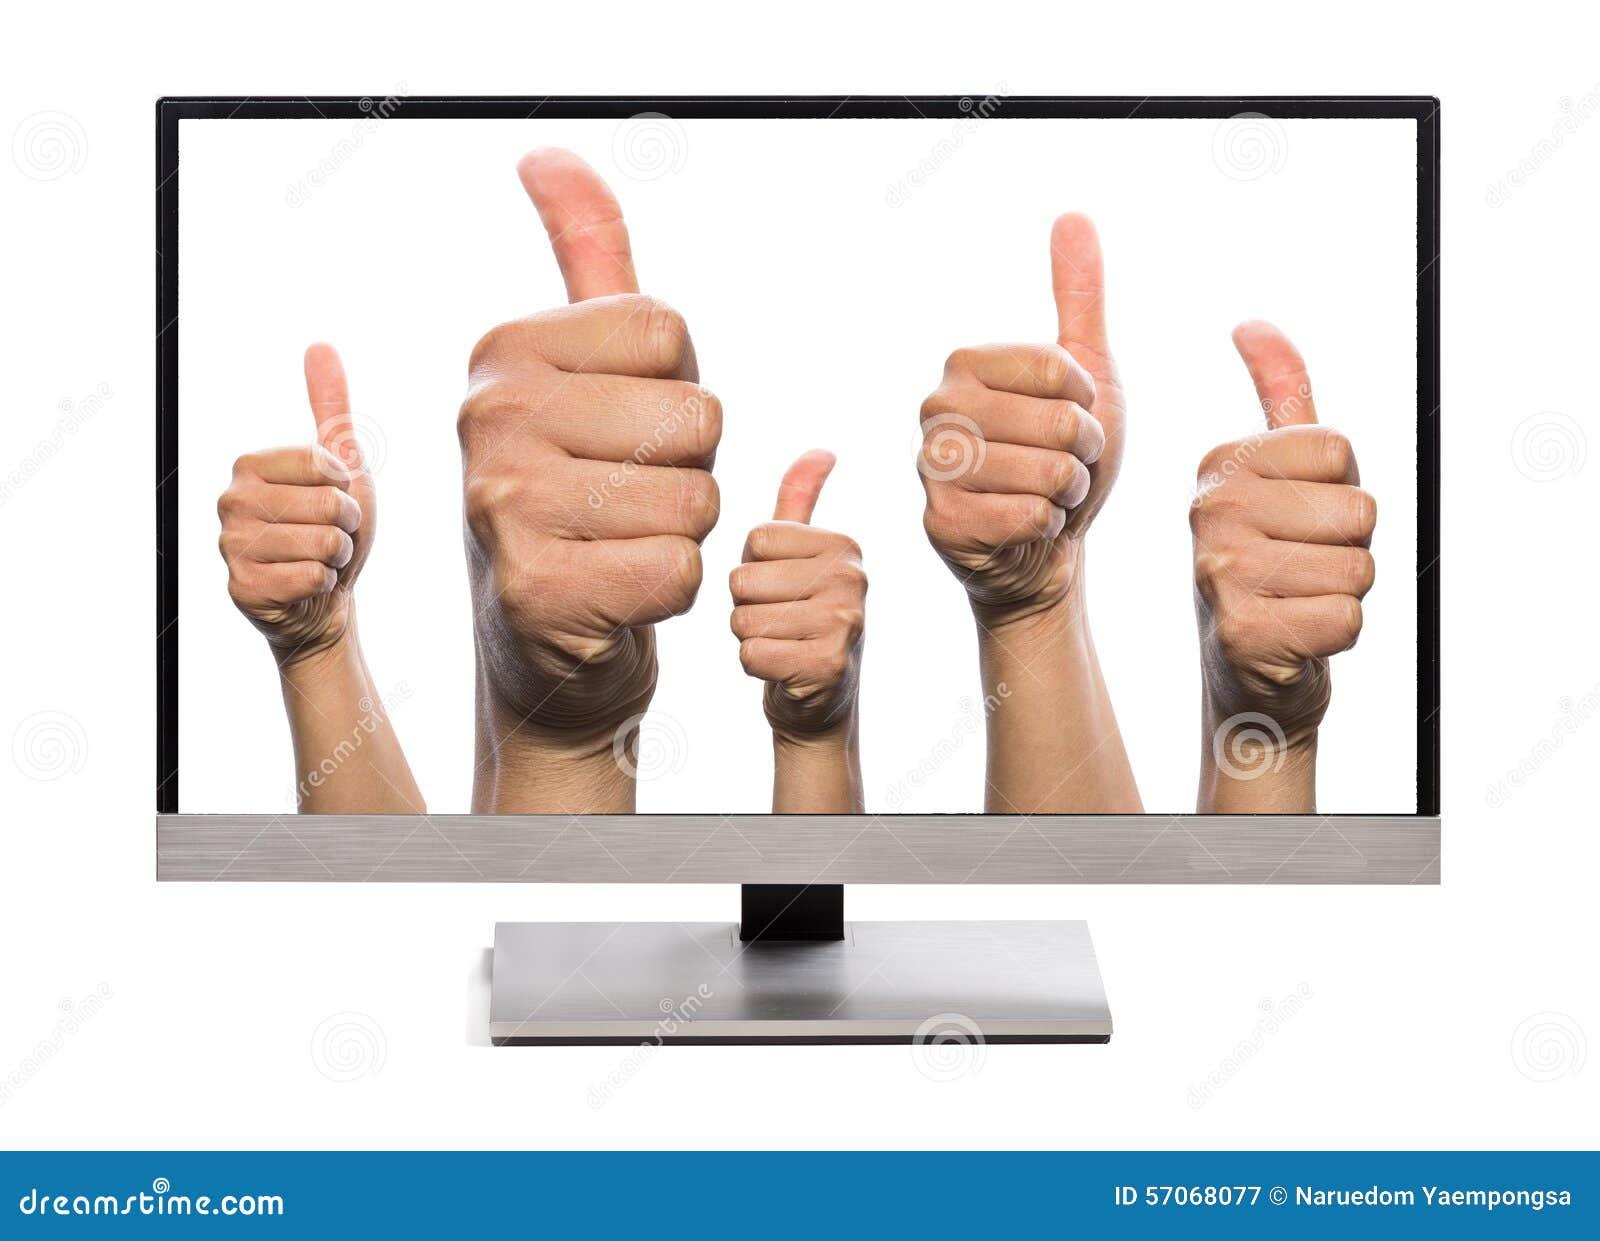 Many thumbs up liking